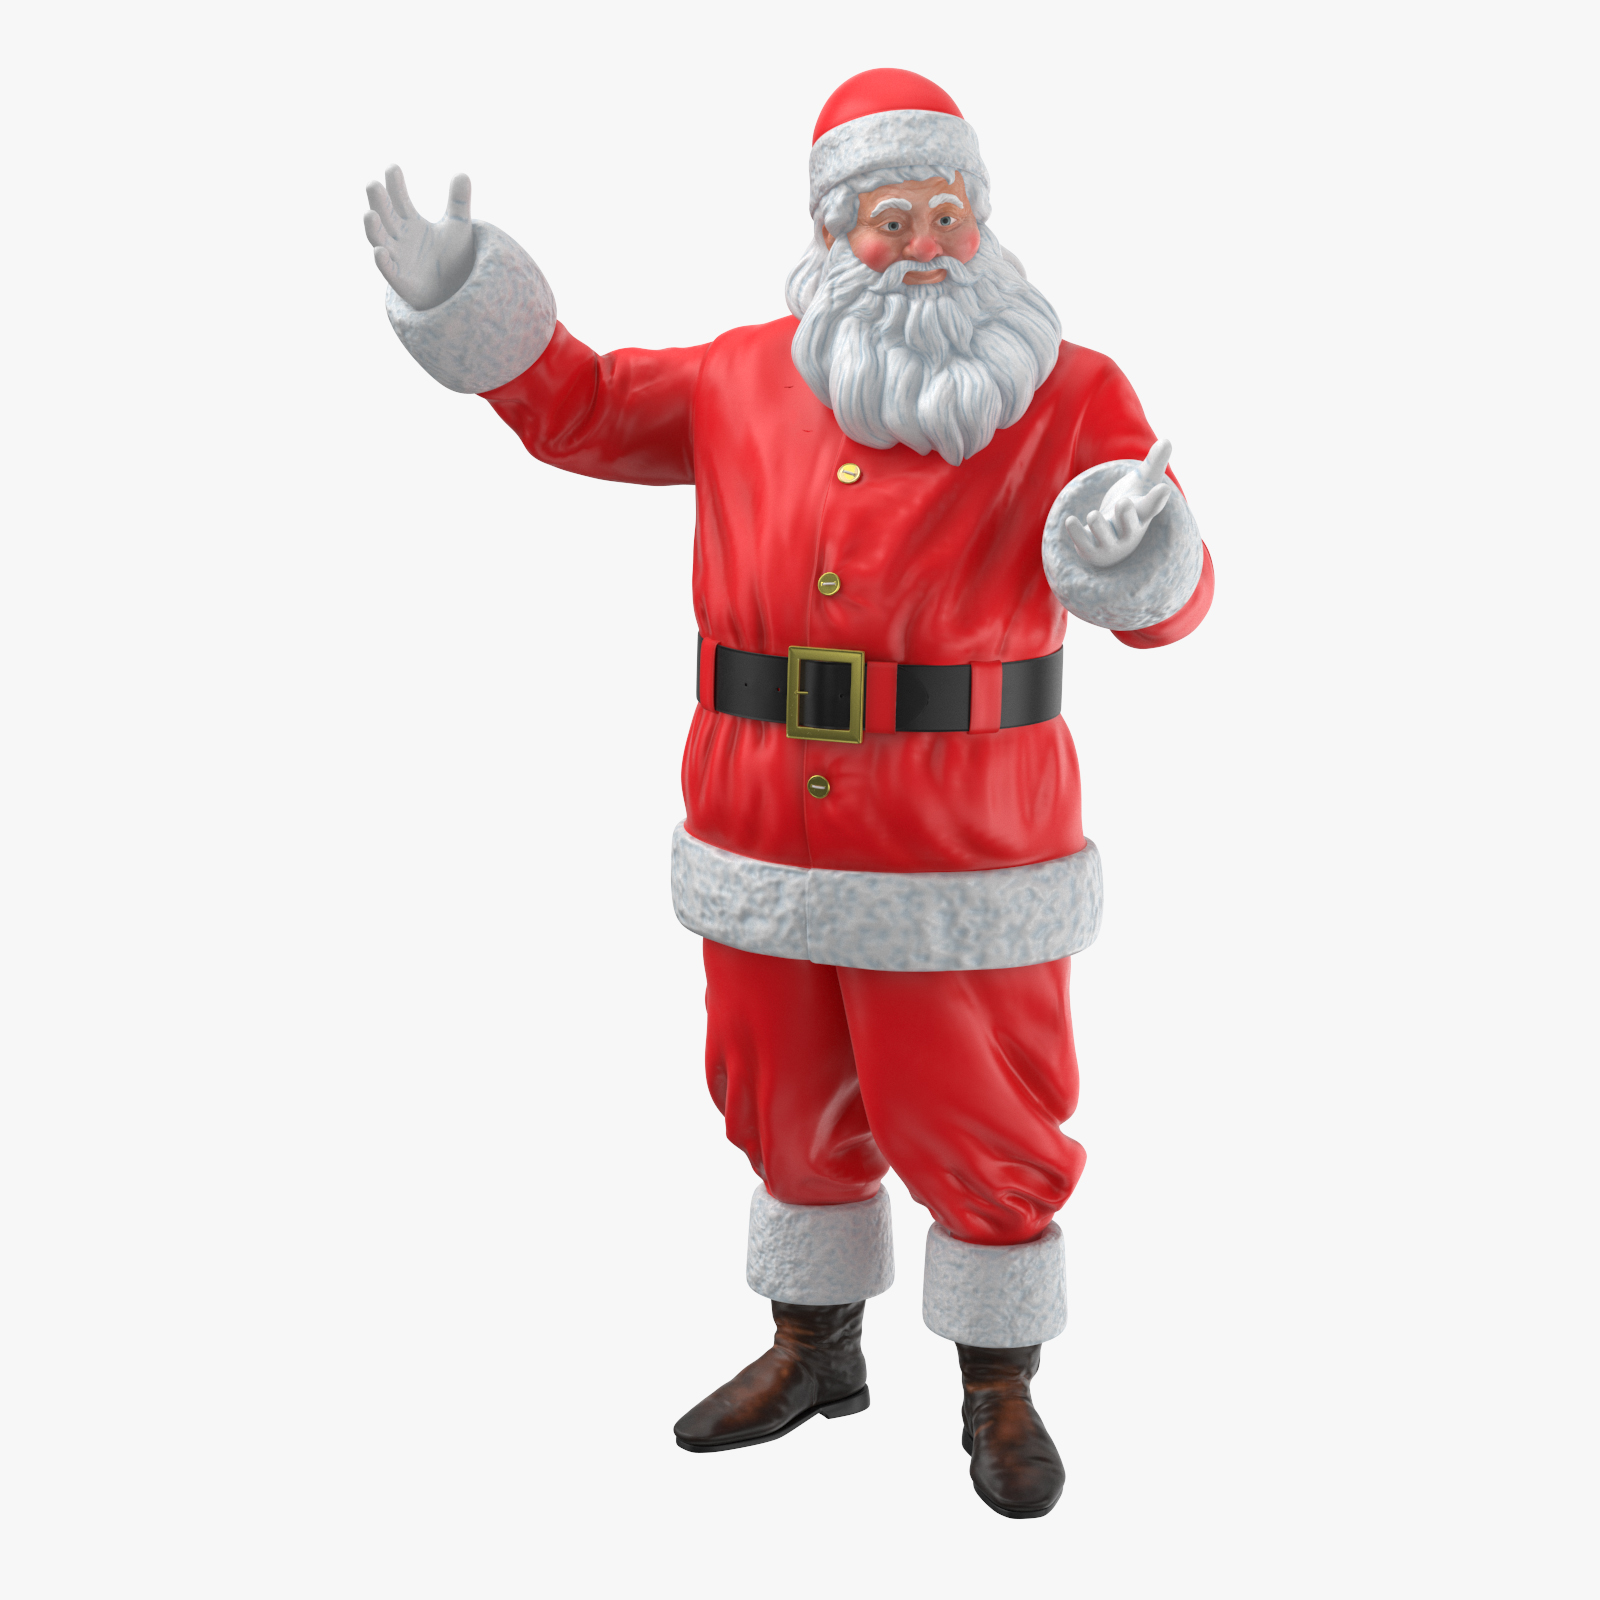 Santa Clause 3D Model